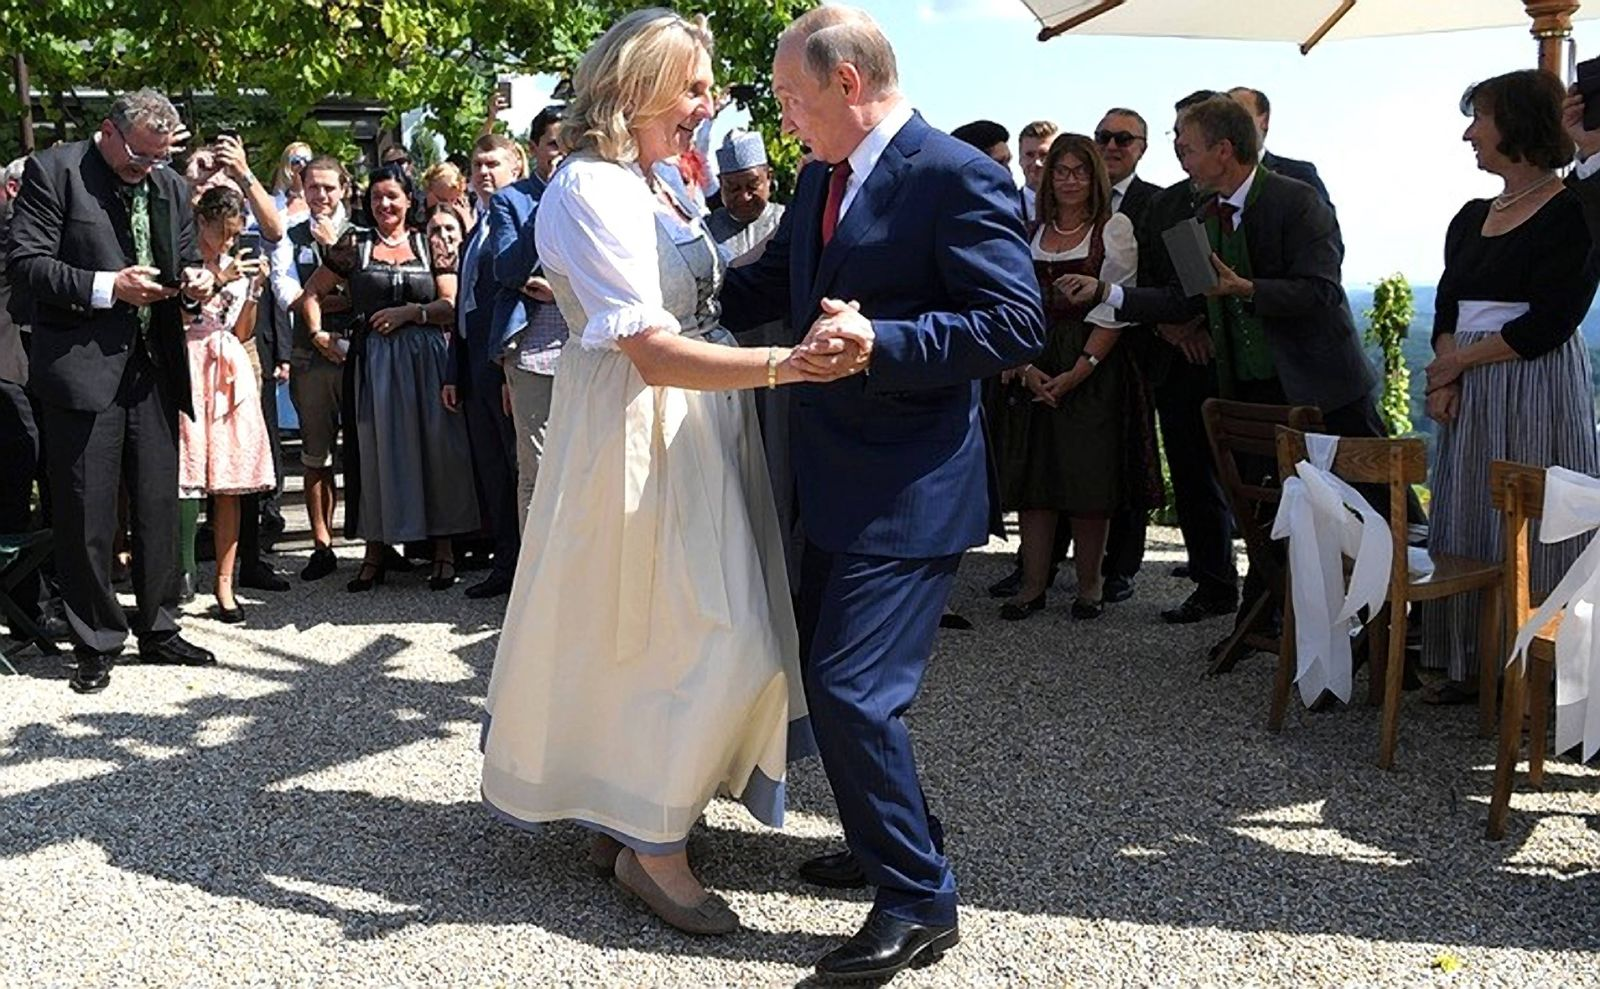 August 18 2018 Gamlitz Austria Russian President Vladimir Putin dances with the bride Austri